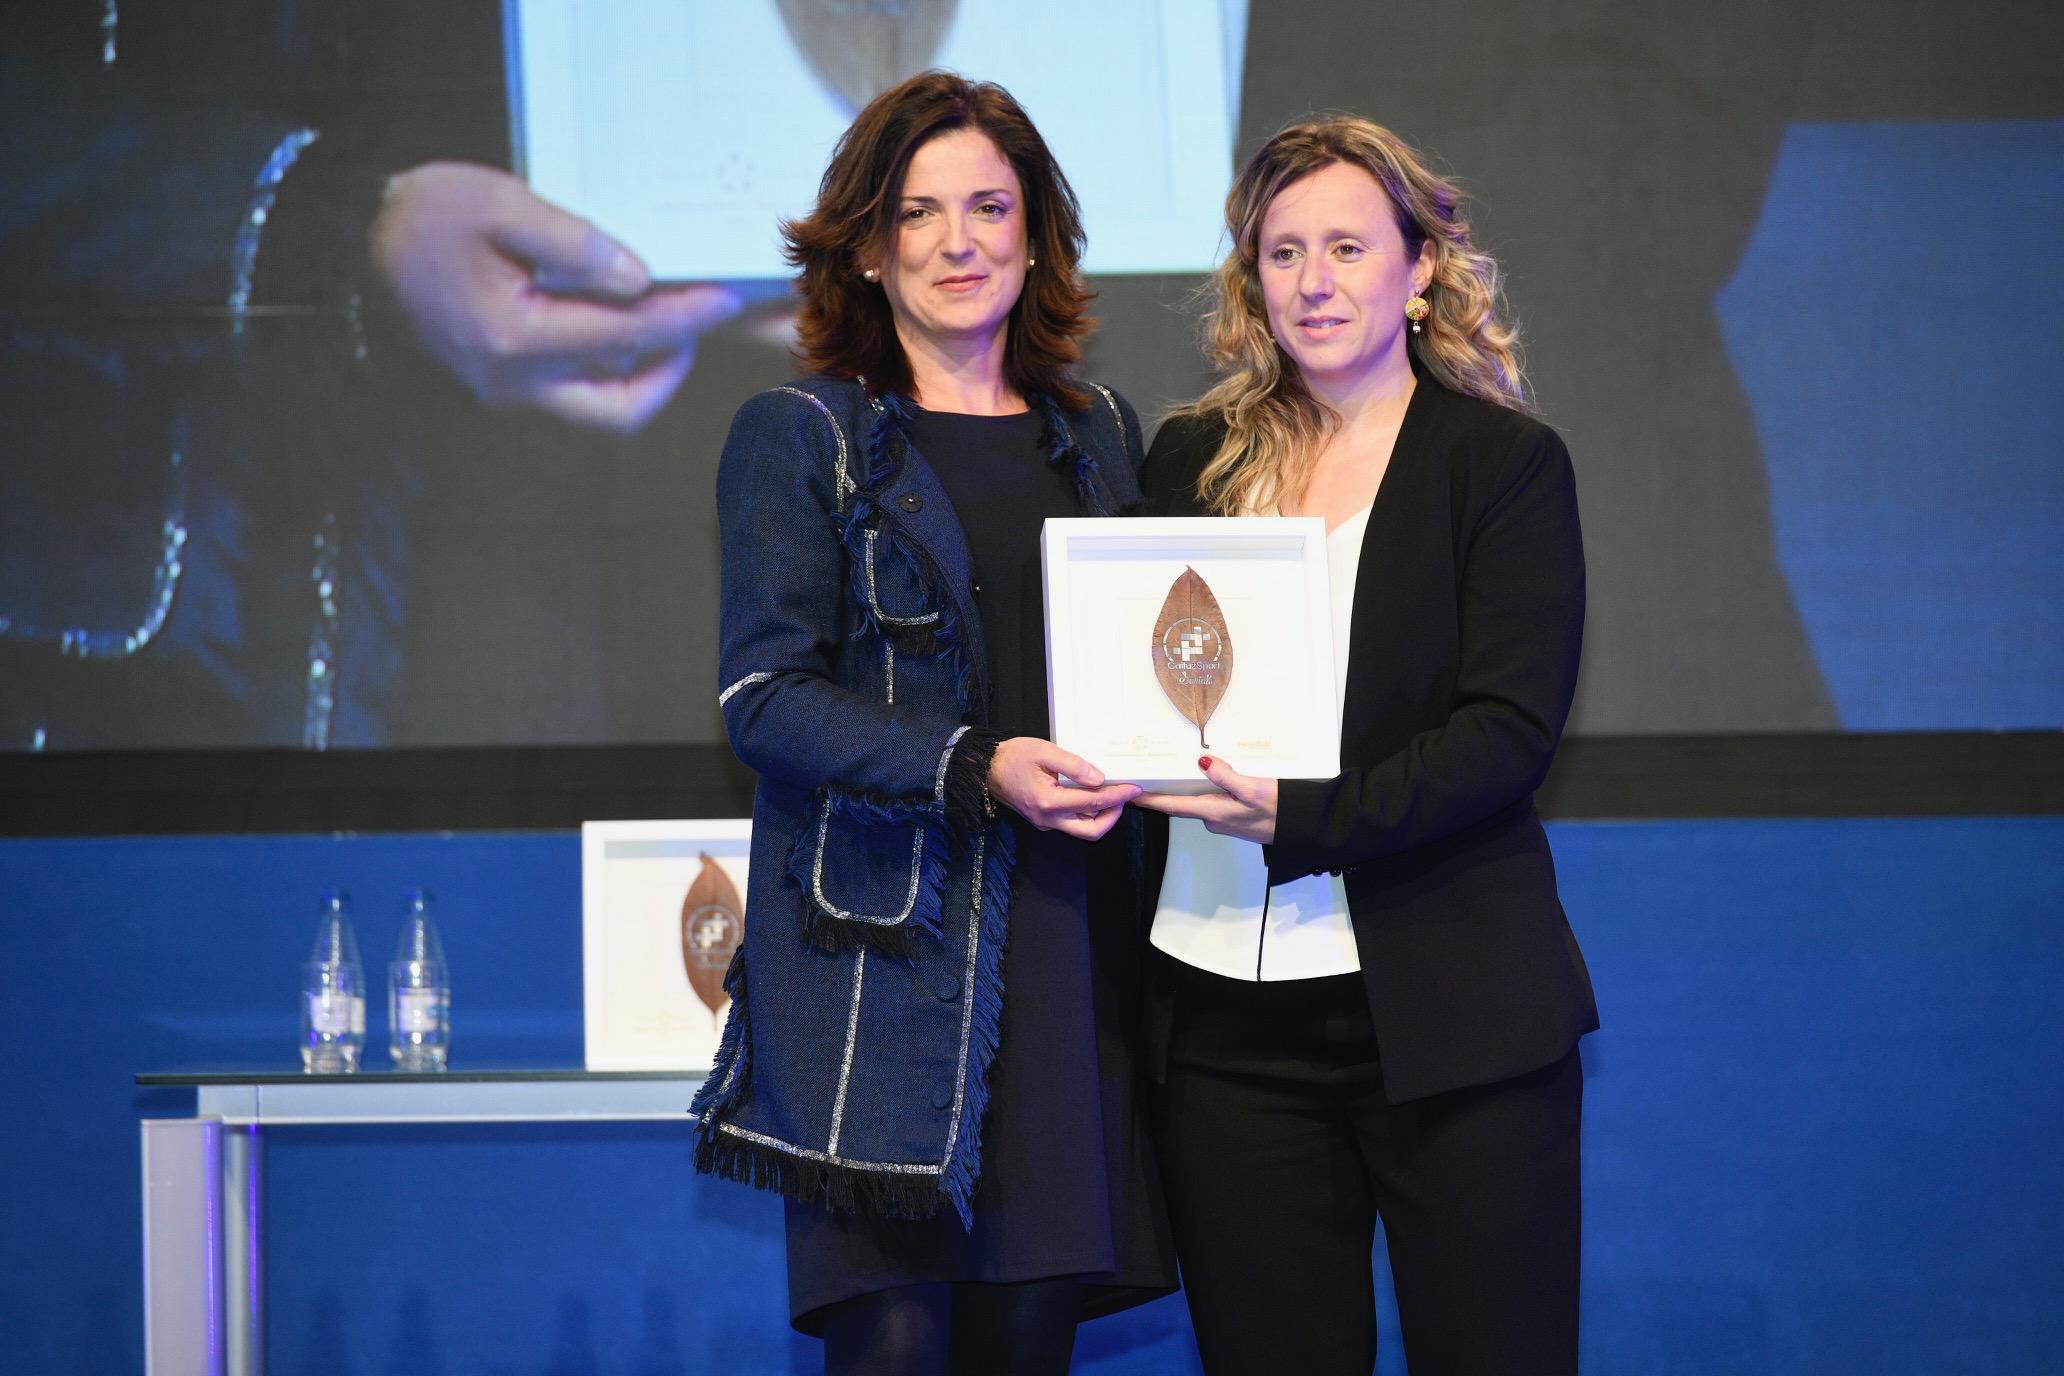 Entrega del Premio GaituzSport al Centro Hegalak